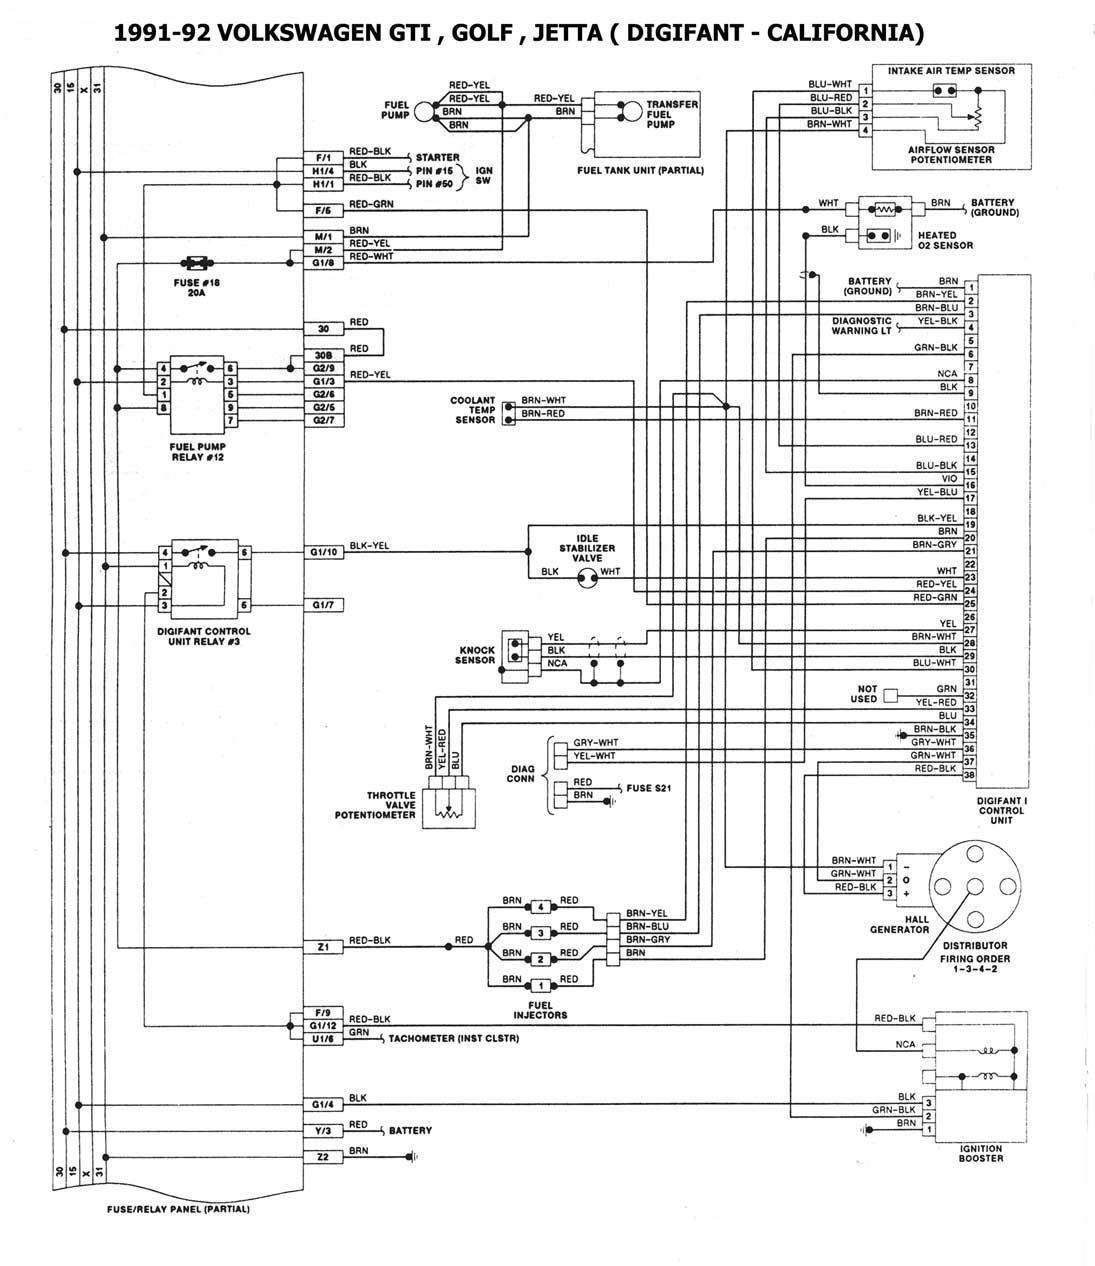 2009 scion xb fuse box diagram